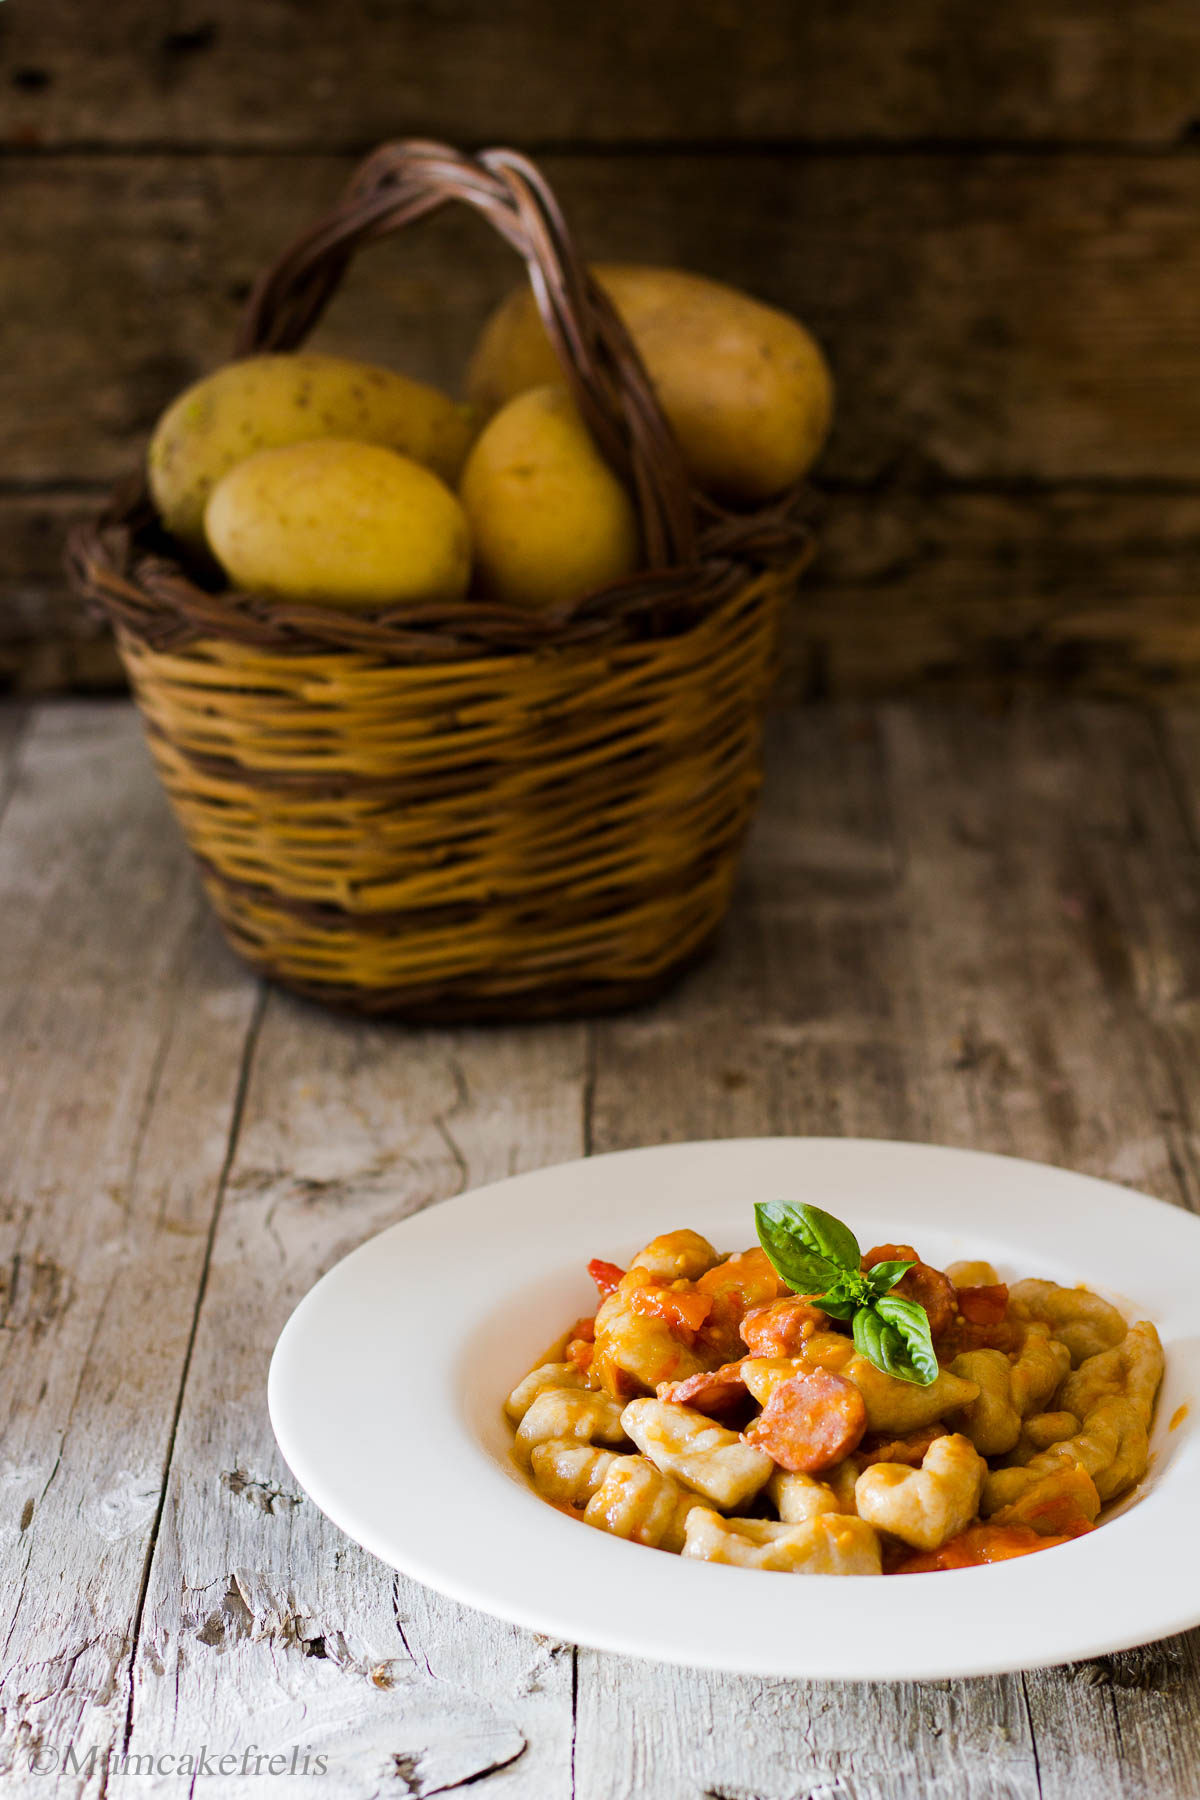 ricetta gnocchi di lenticchie e patate